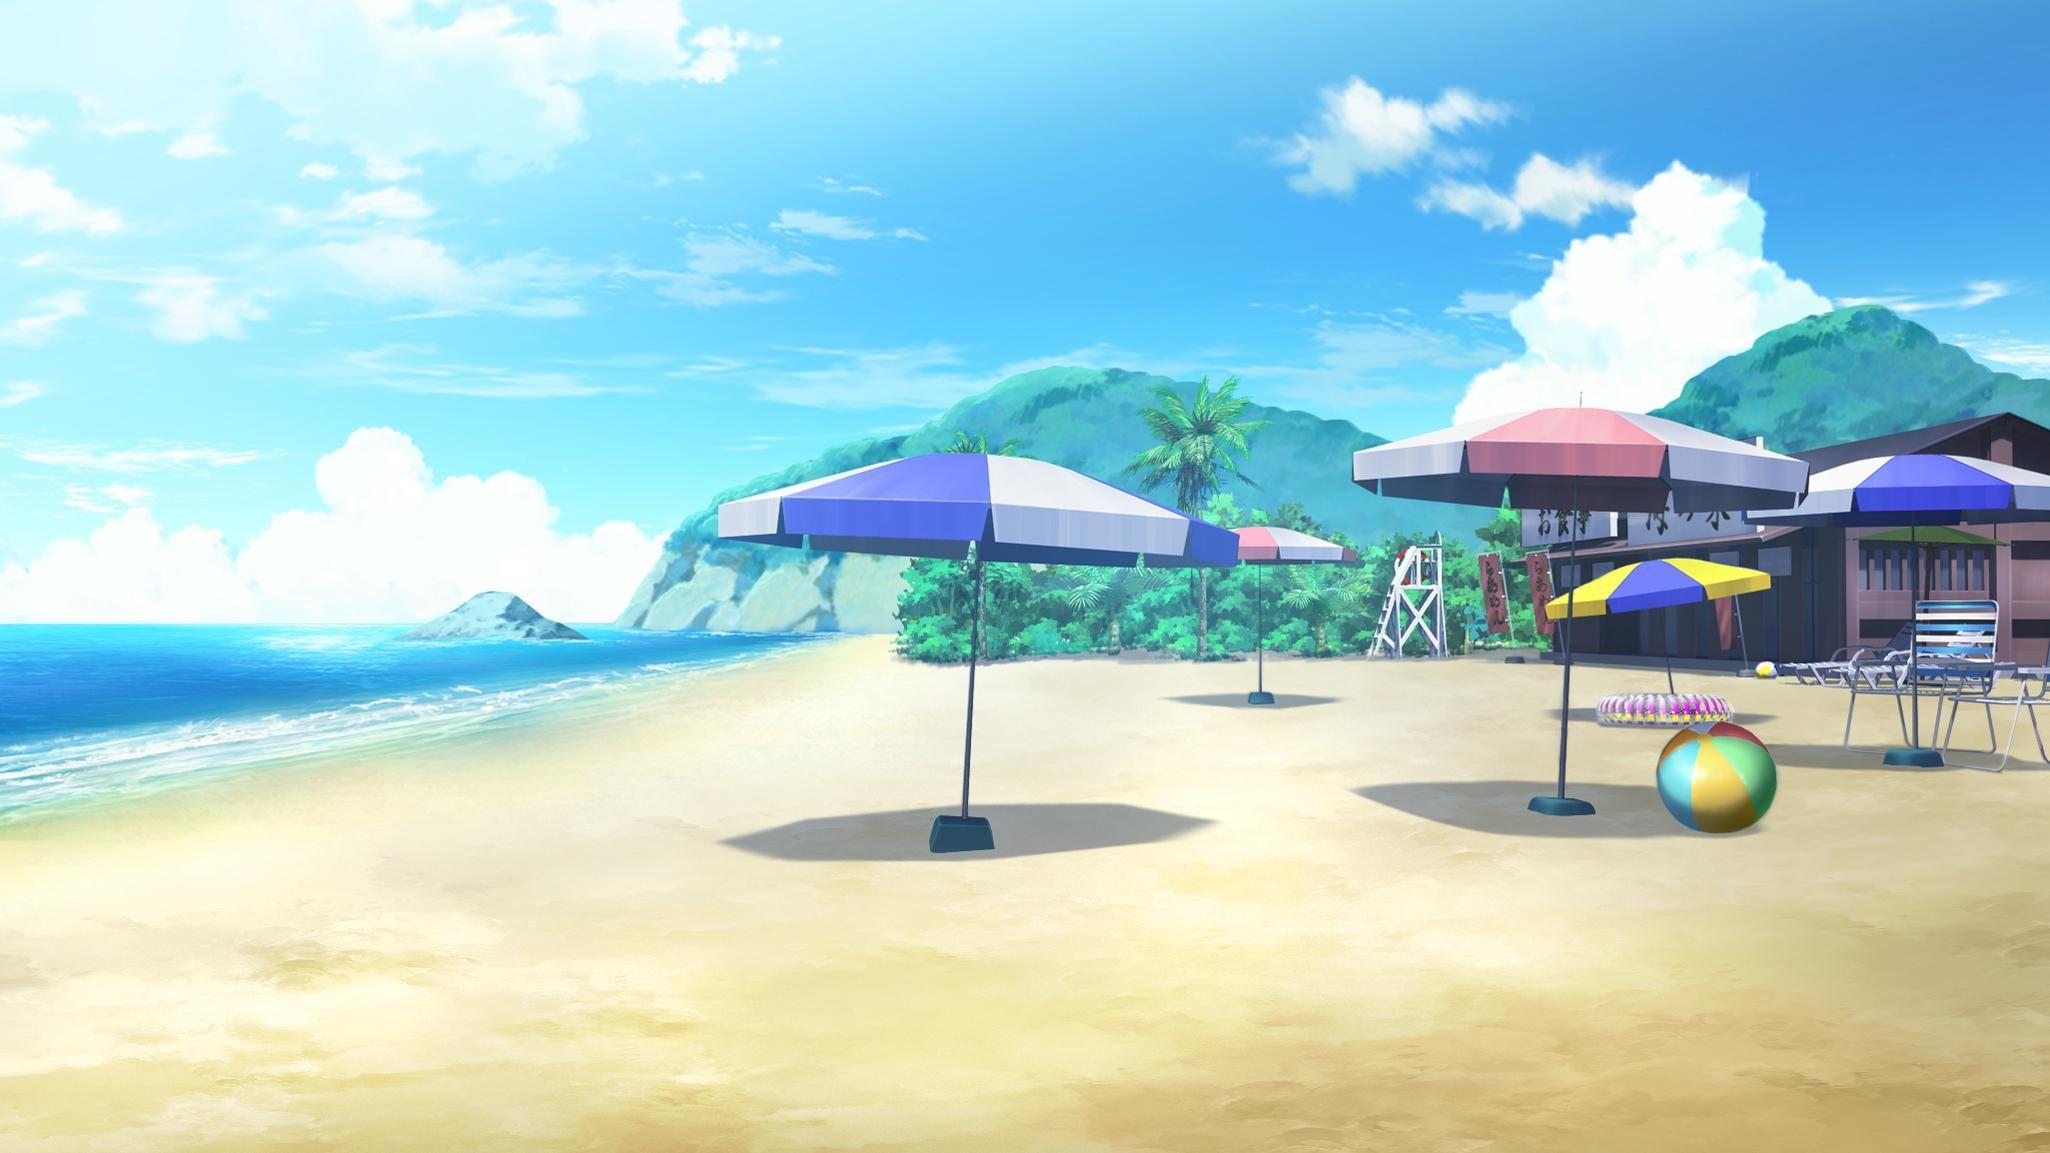 Iyoshi Beach 5b9c6d52b7cb8586a5309086e1337d18